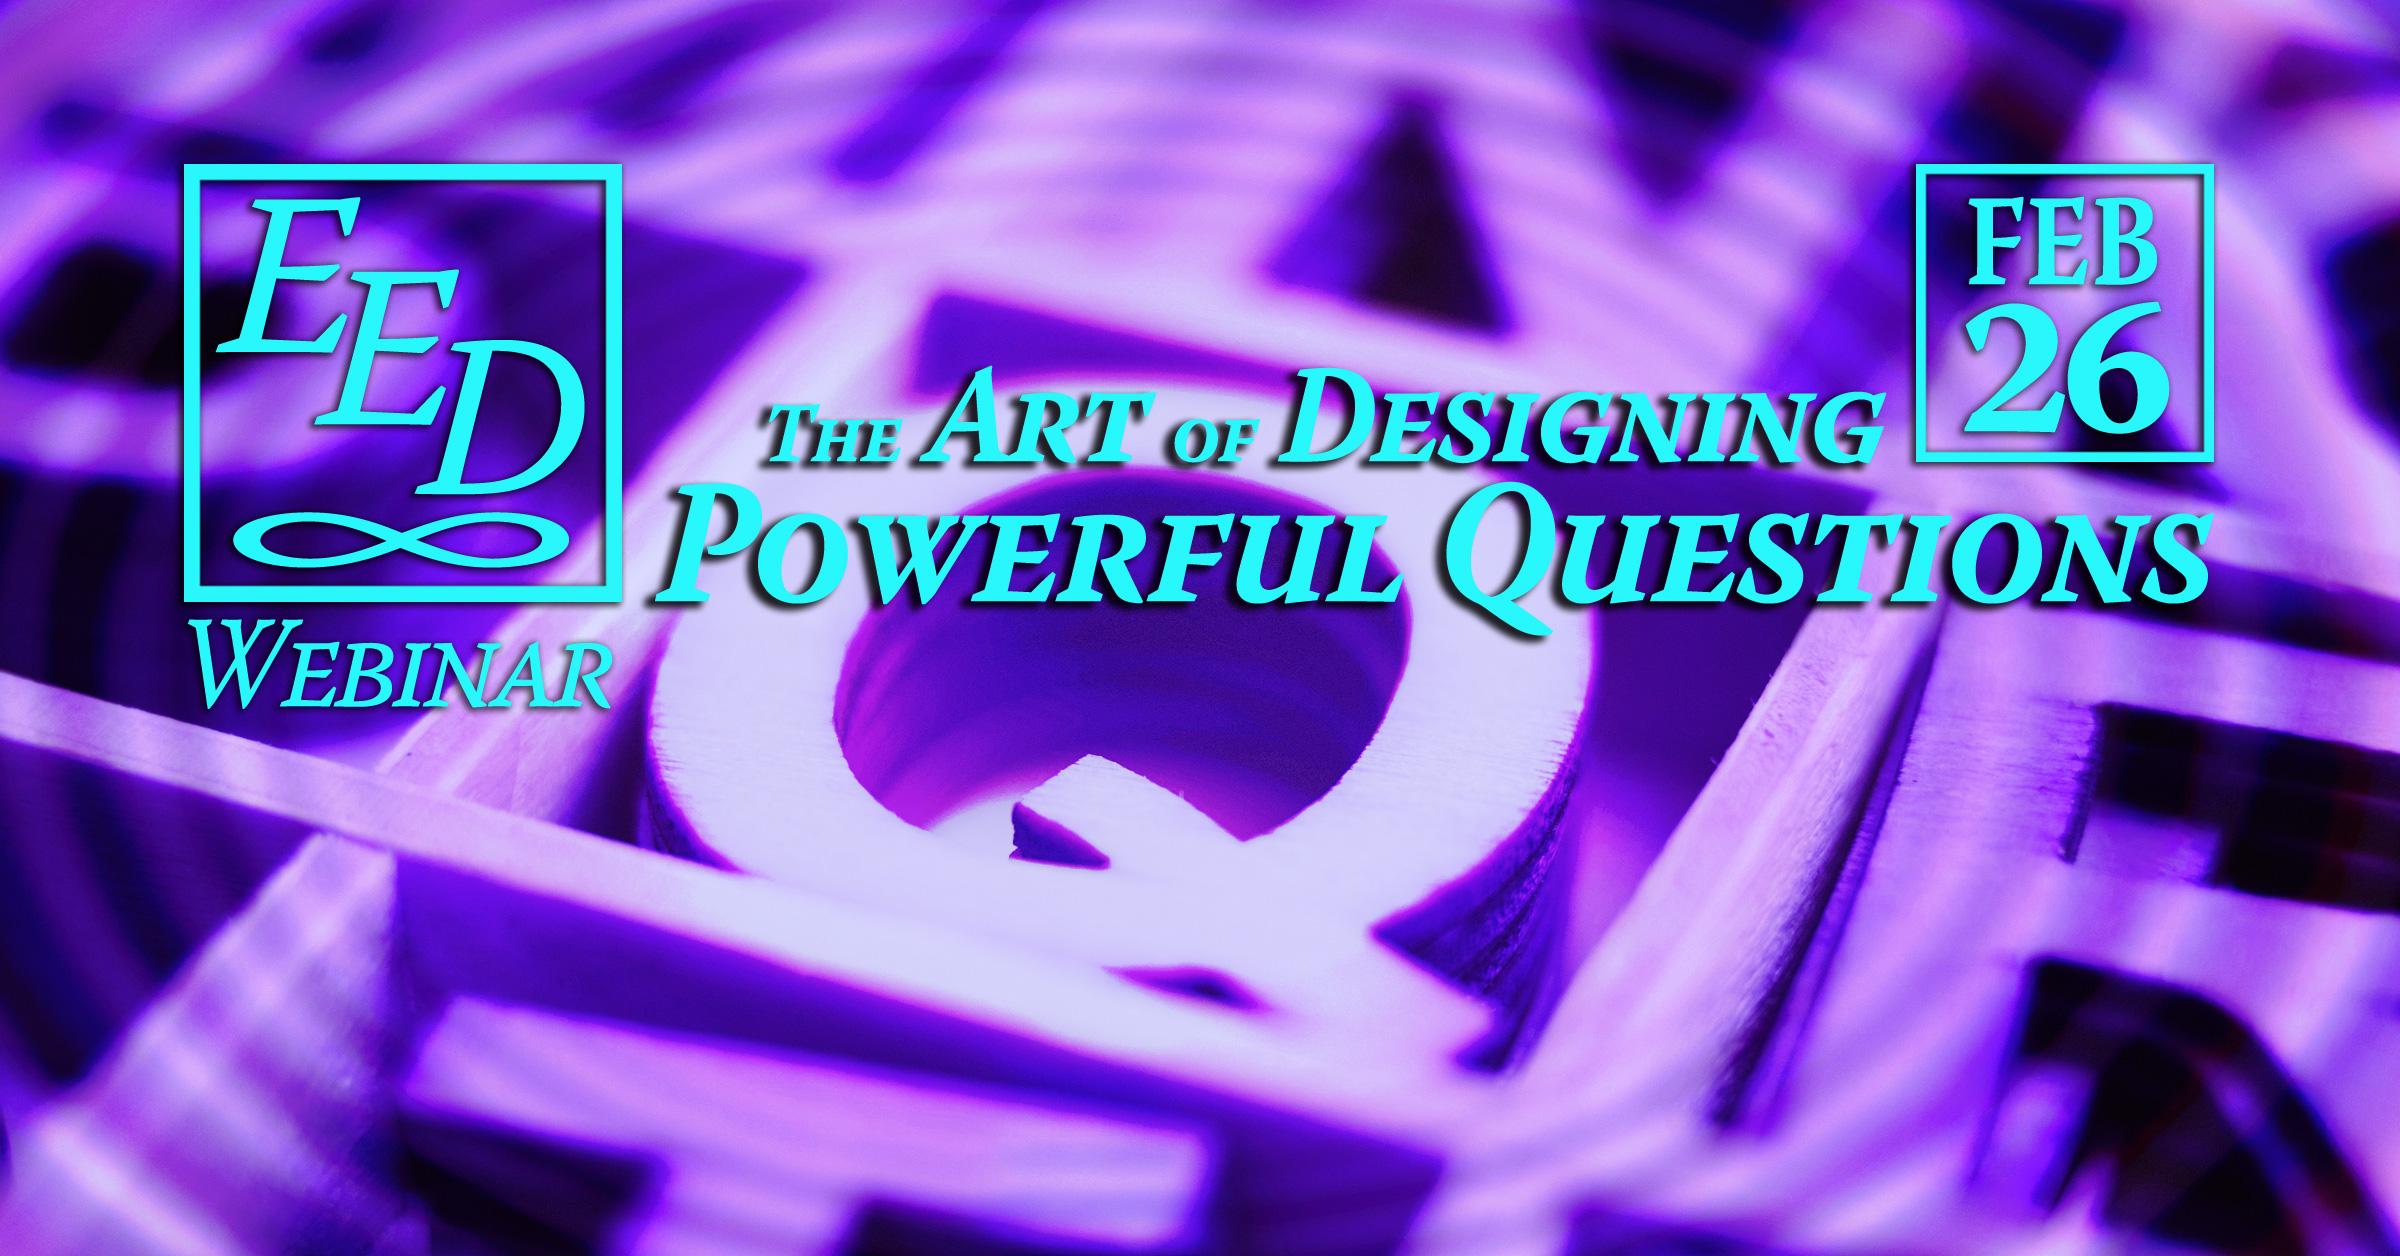 Webinar #4: Art of Designing Powerful Questions